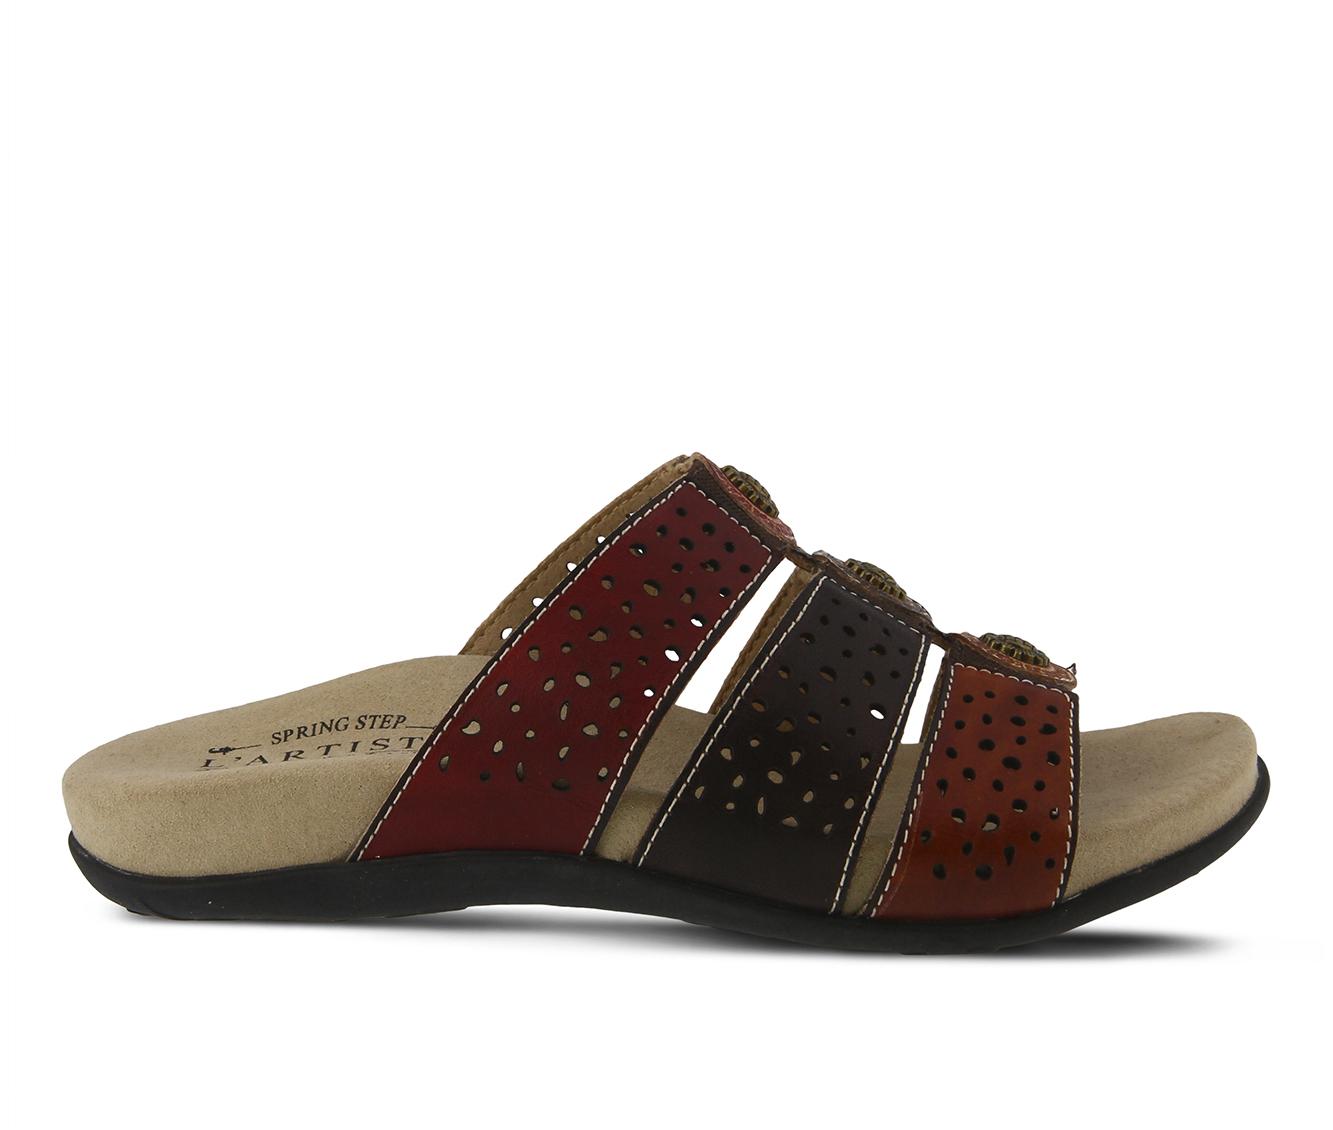 L'Artiste Glennie Women's Sandal (Red Leather)